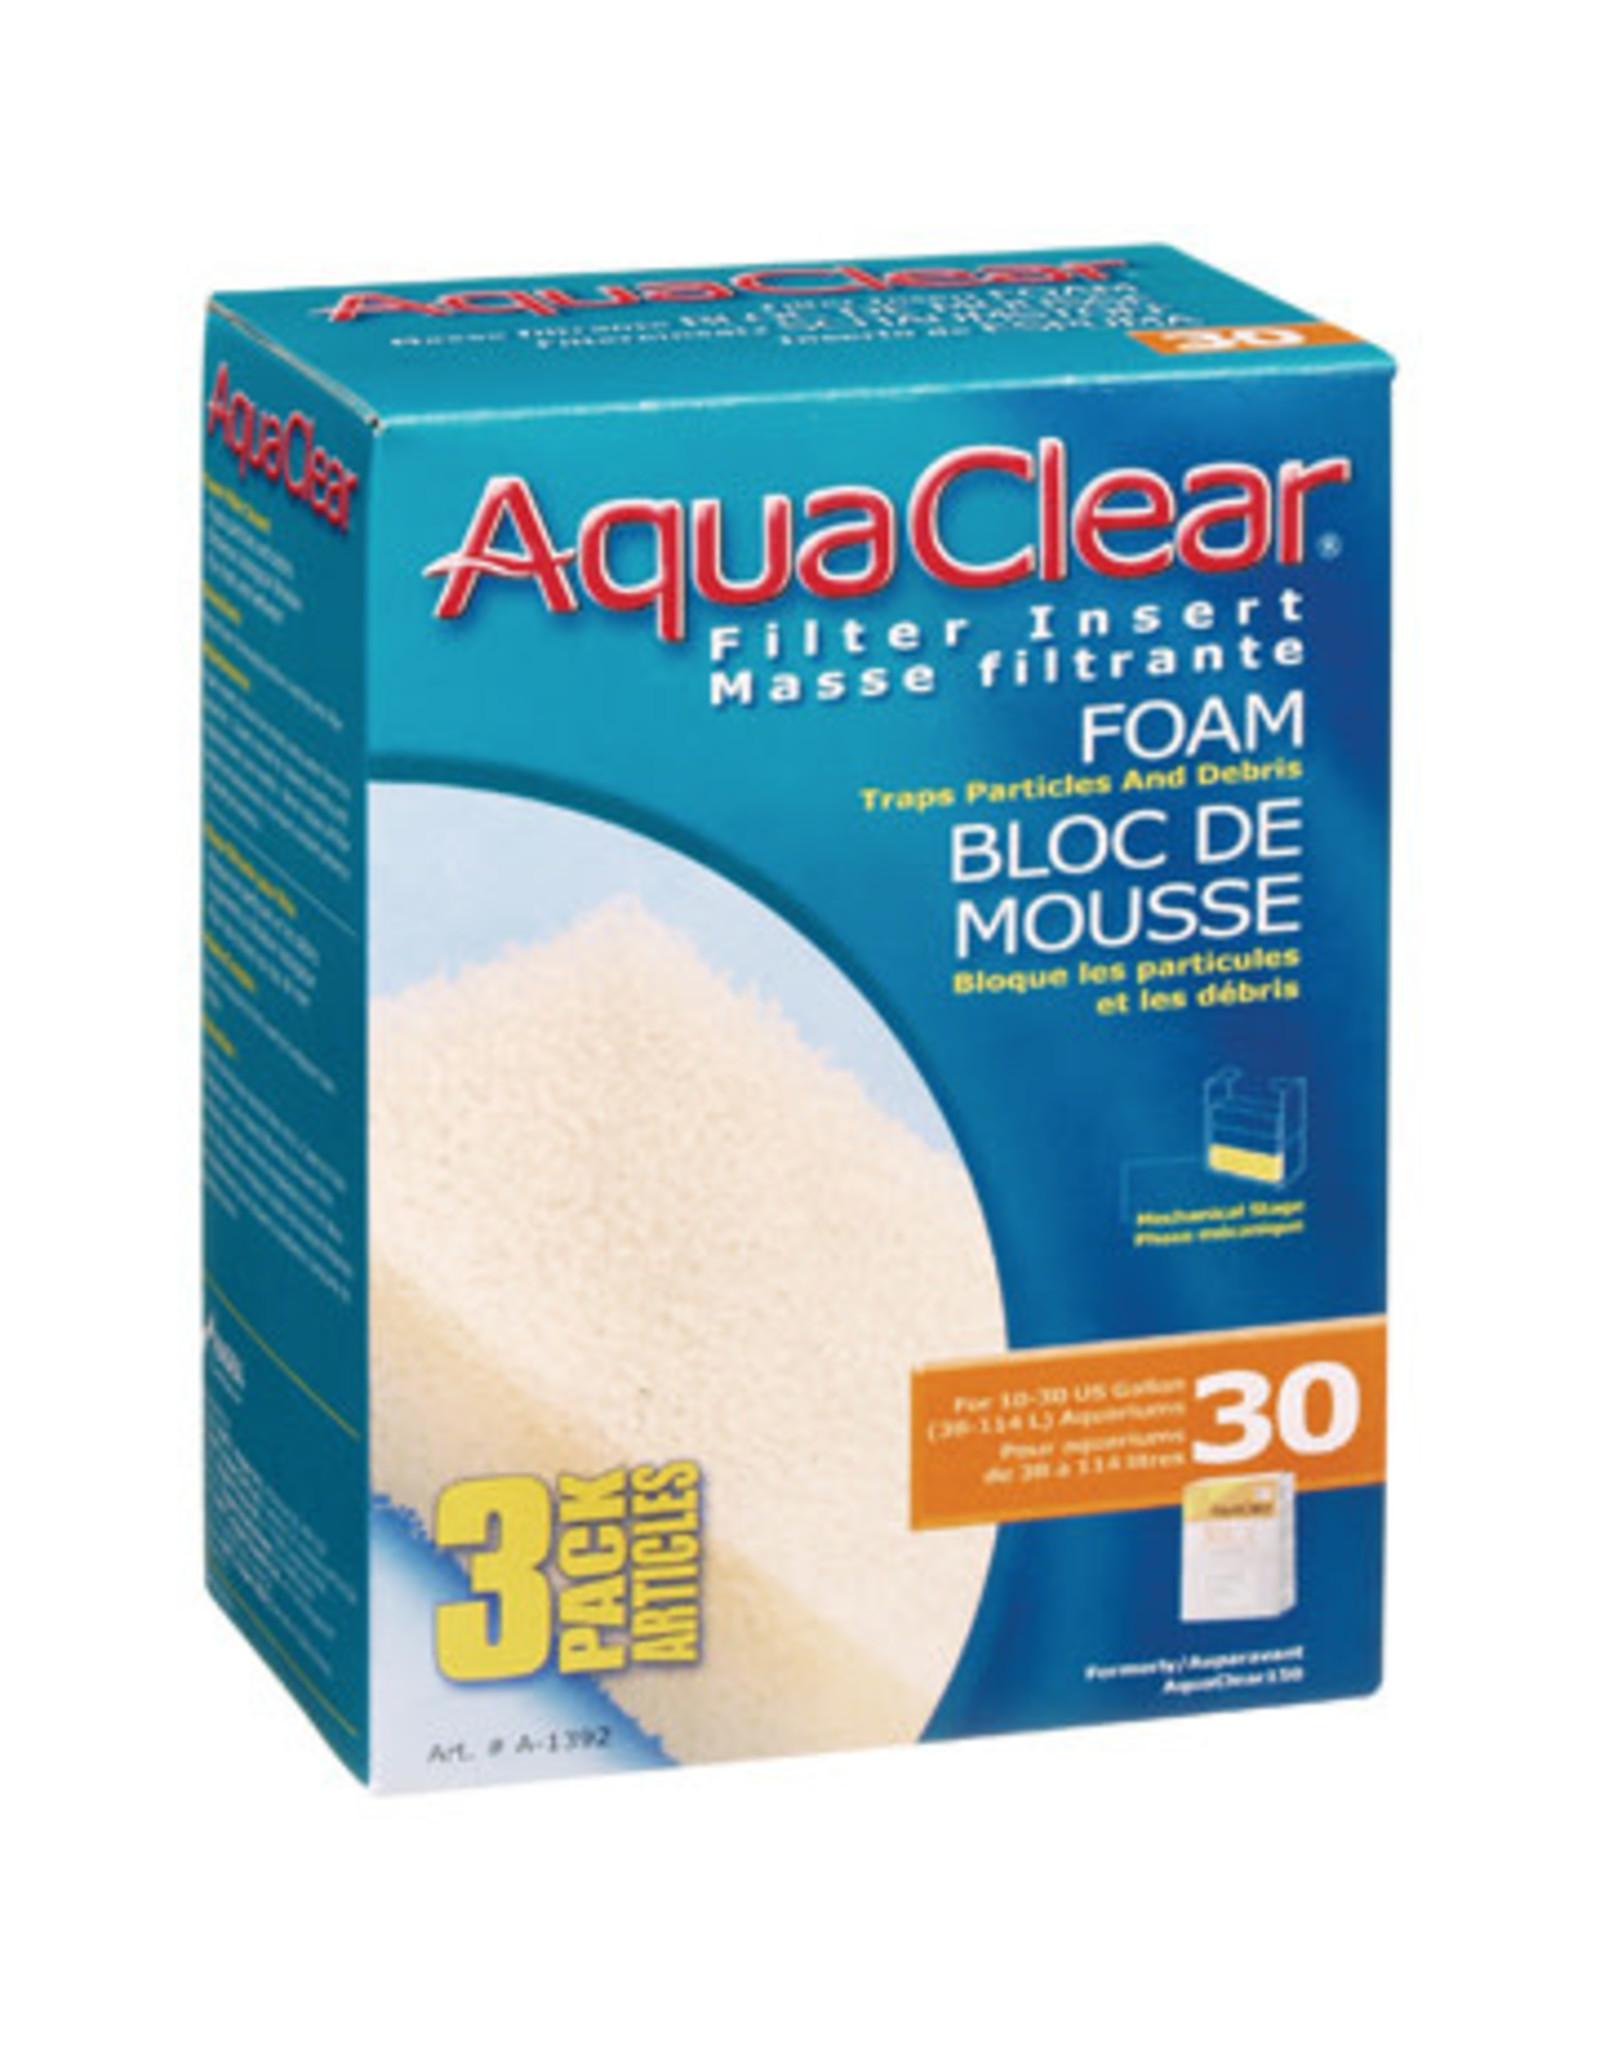 AquaClear AquaClear 30 Foam Filter insert 3 Pack